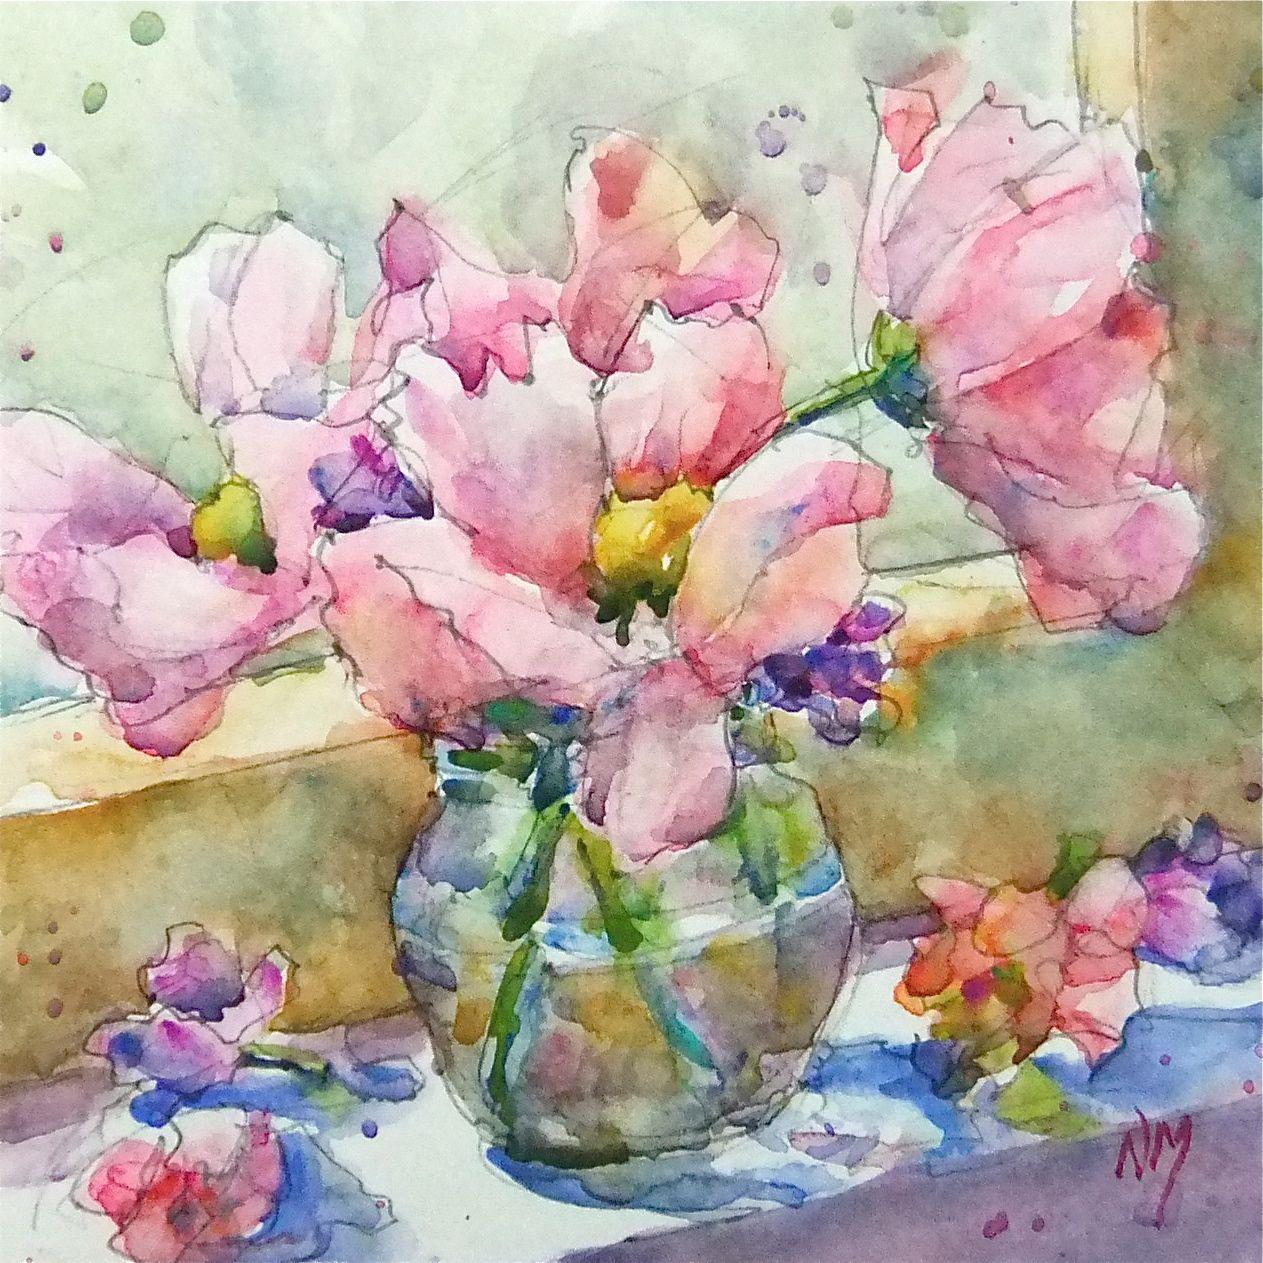 Watercolor Flower Painting: Artist: December 2012